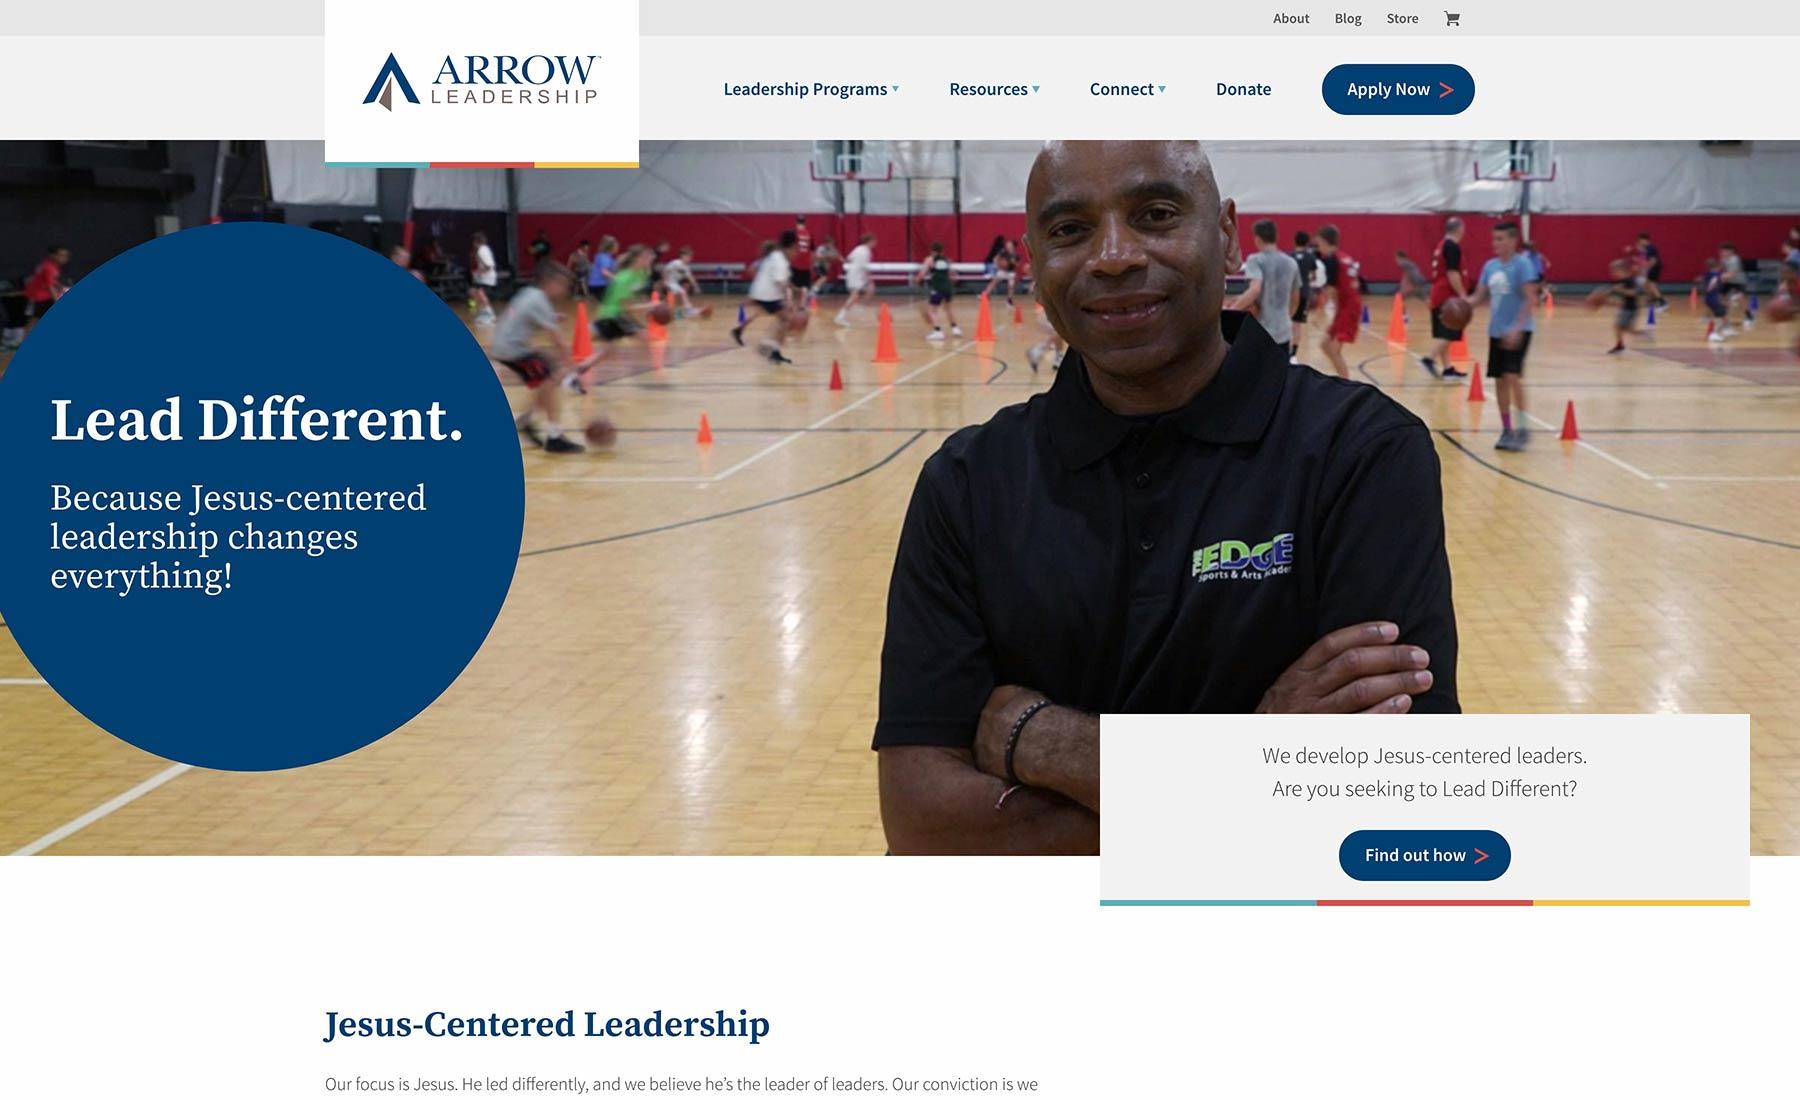 Arrow Leadership Desktop Website Preview